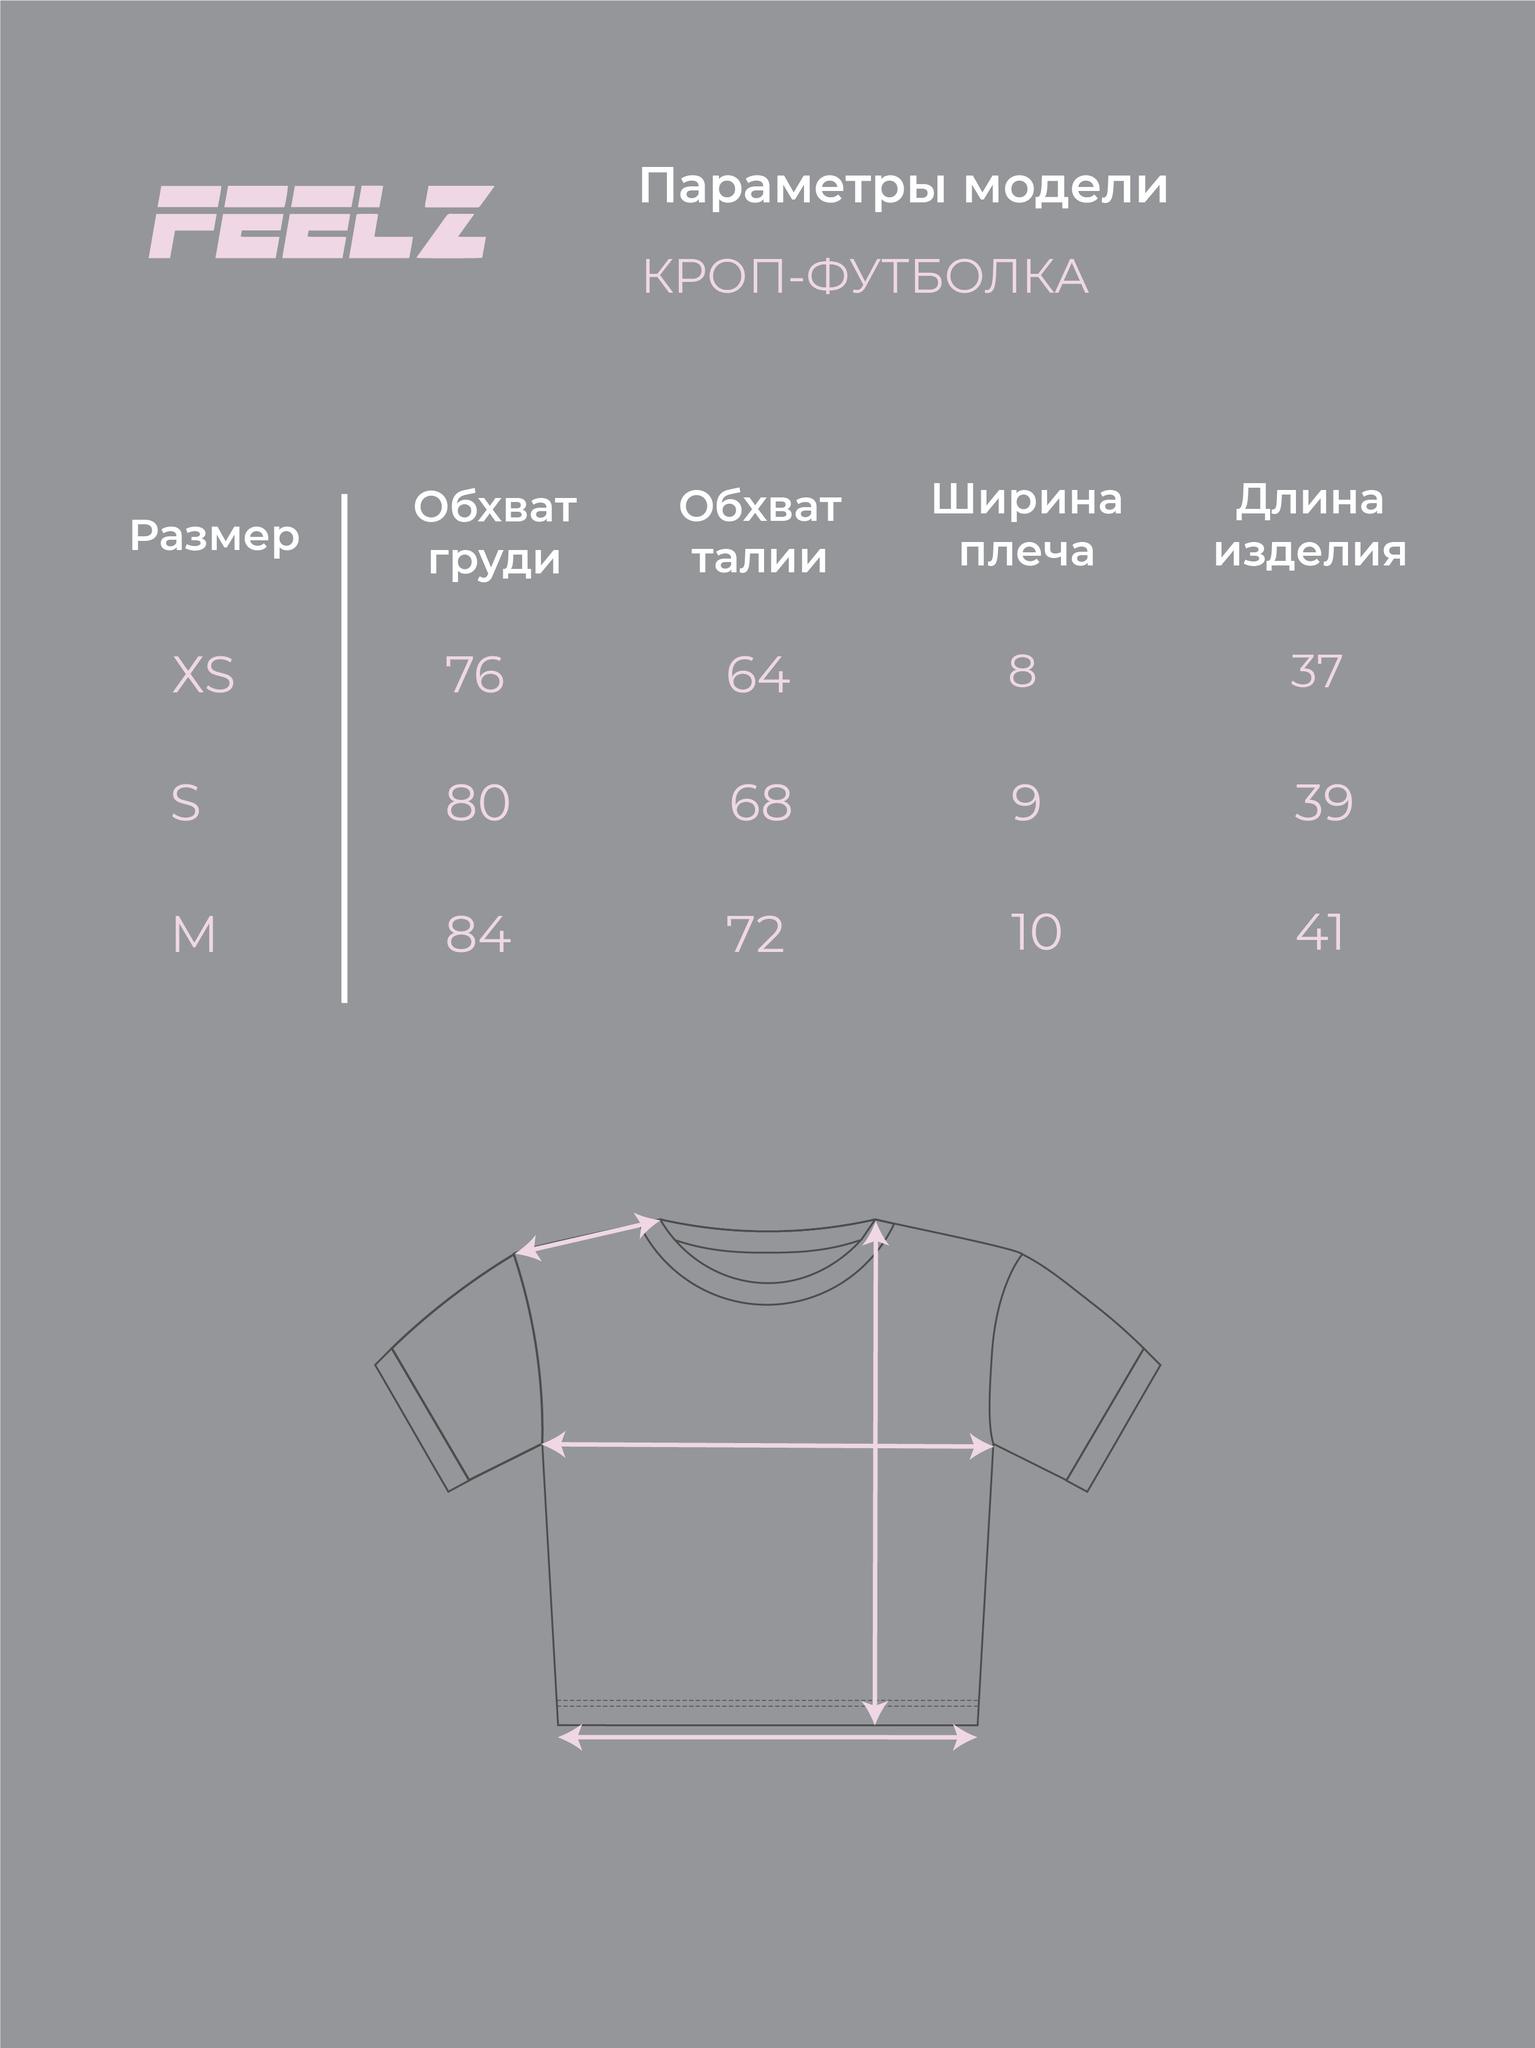 Кроп-футболка BlankMSC, Белый